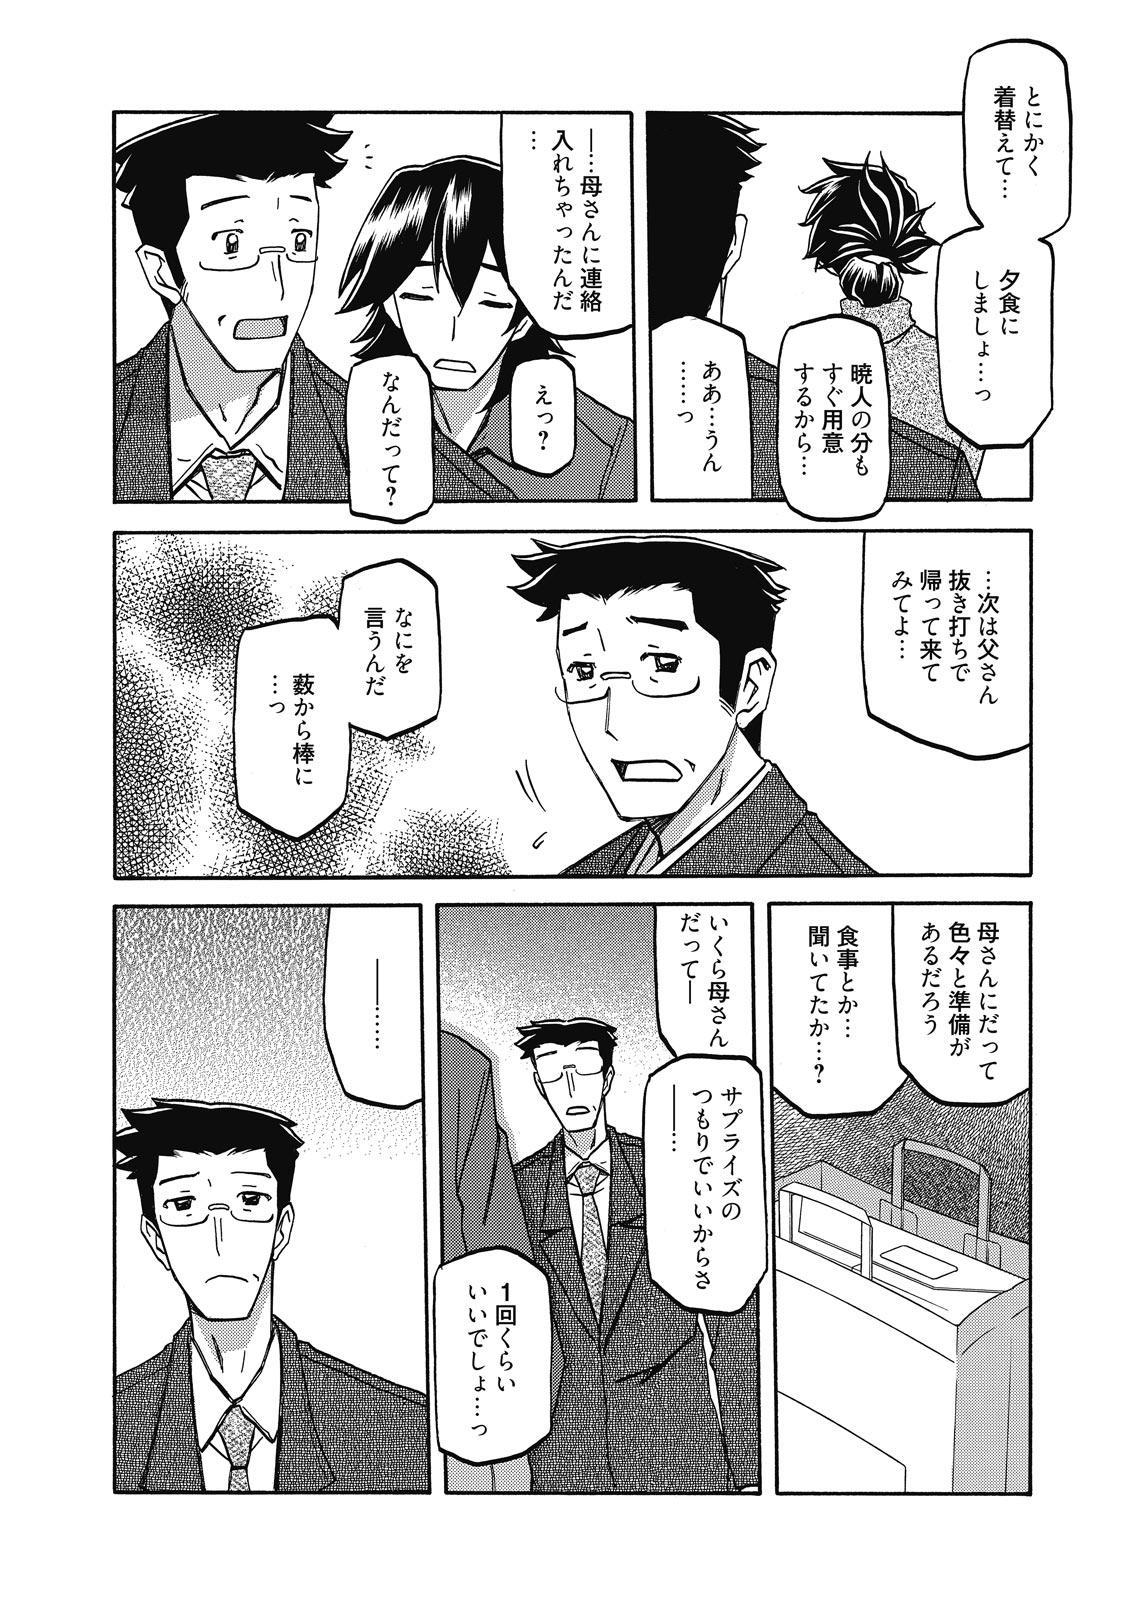 Web Manga Bangaichi Vol. 7 51